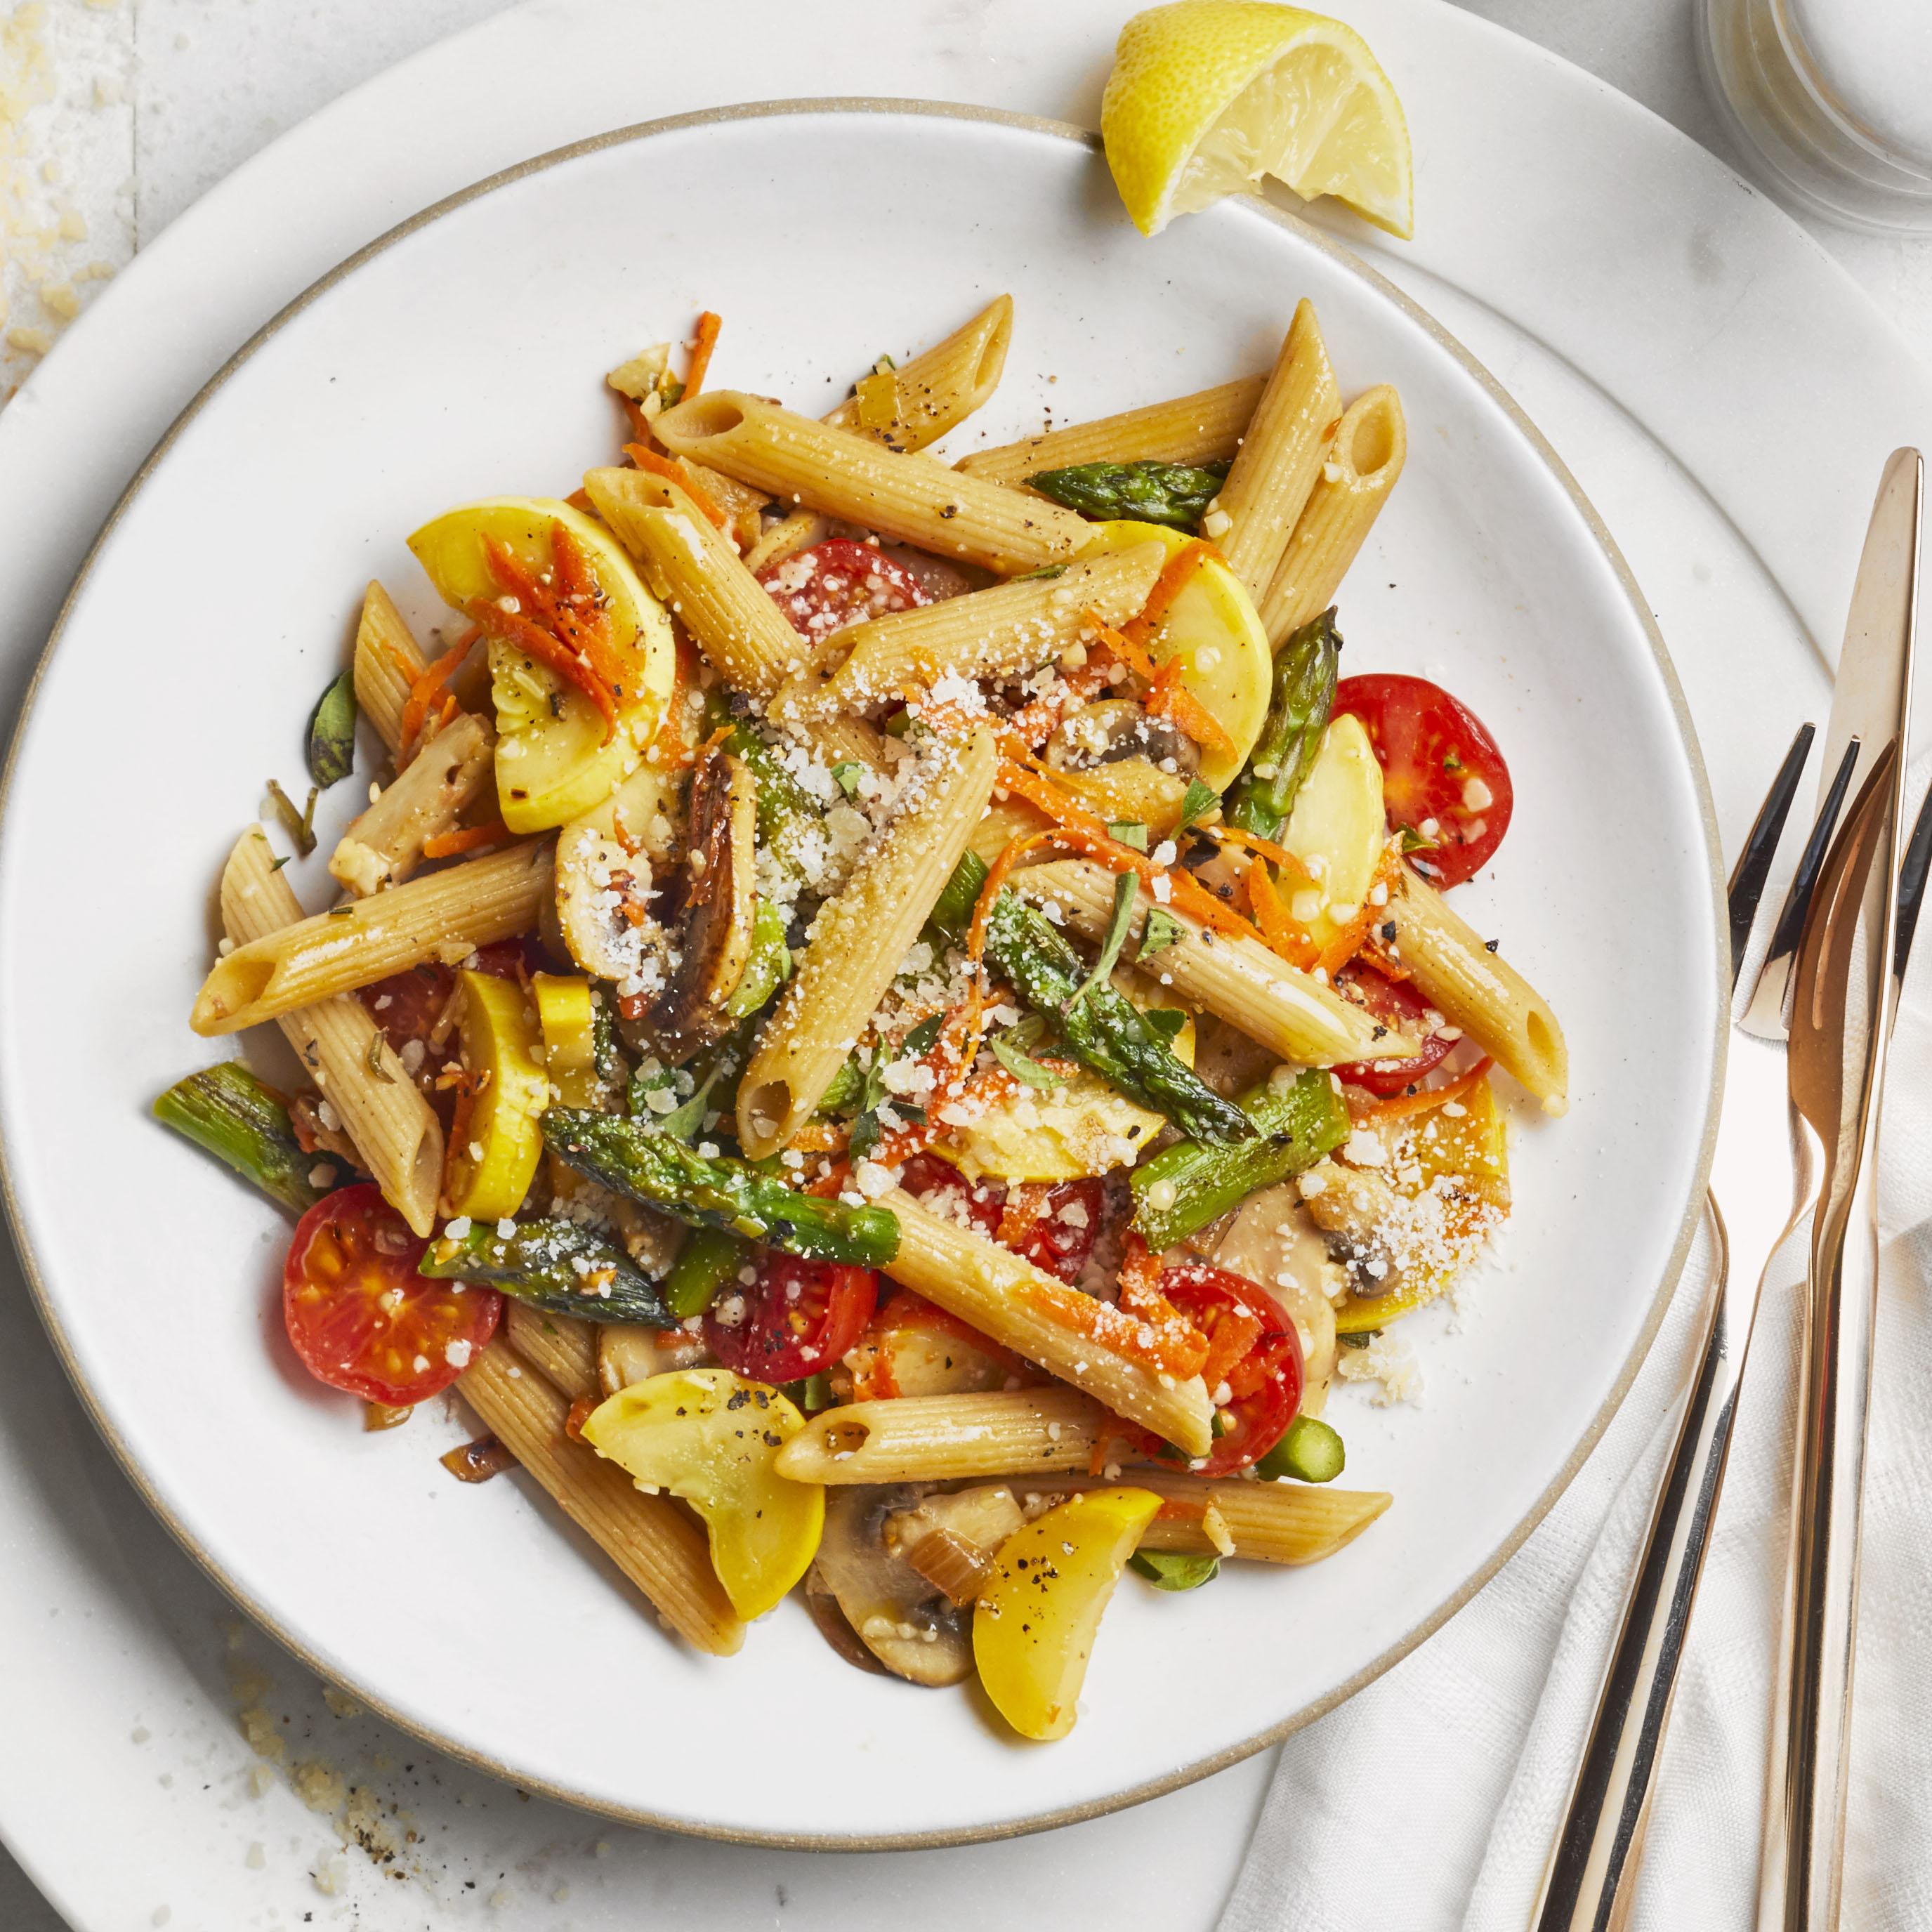 Healthy Pasta Primavera Allrecipes Magazine